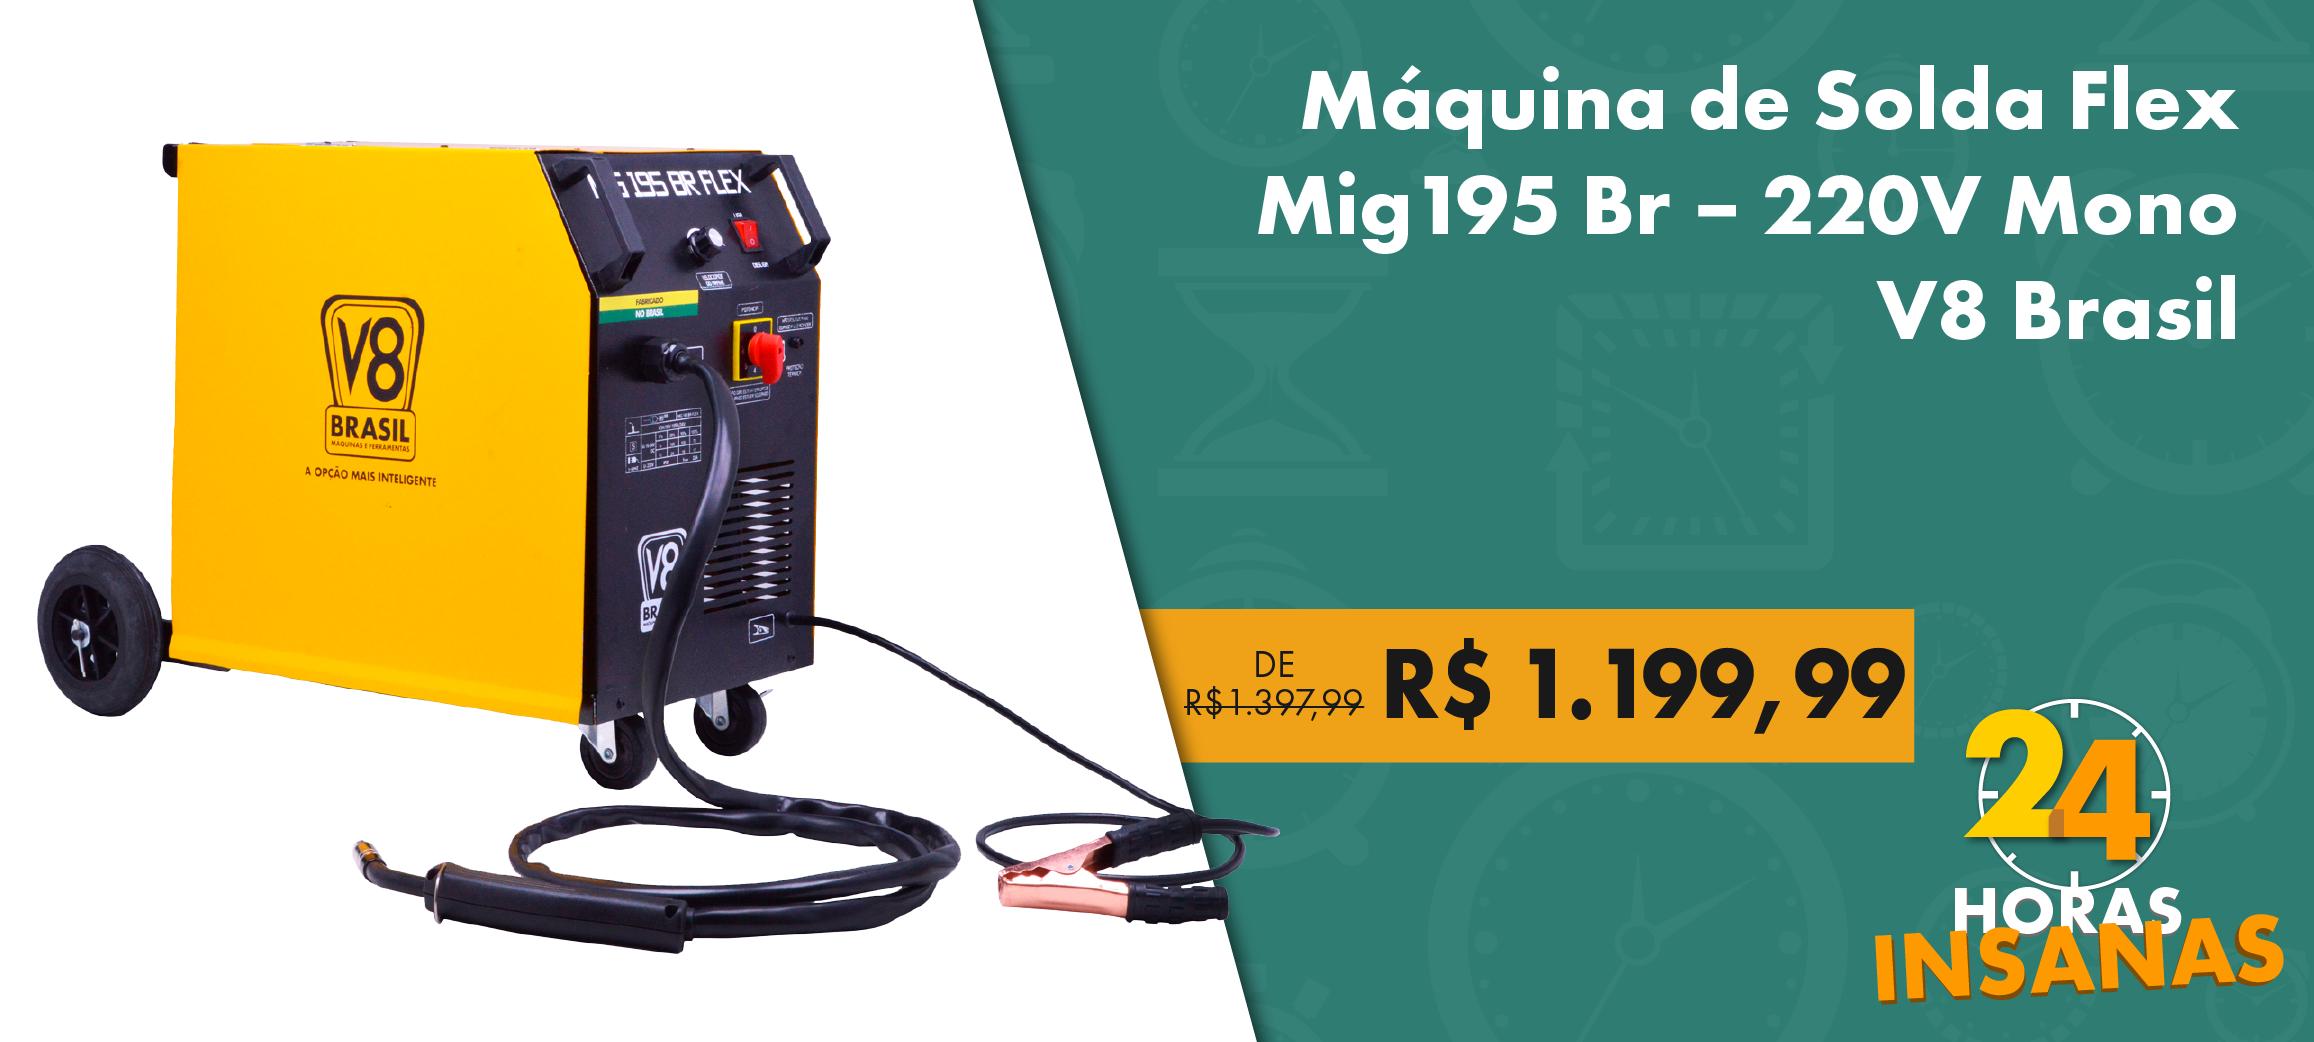 Máquina de Solda Flex Mig195 Br V8 Brasil – 220 V Mono